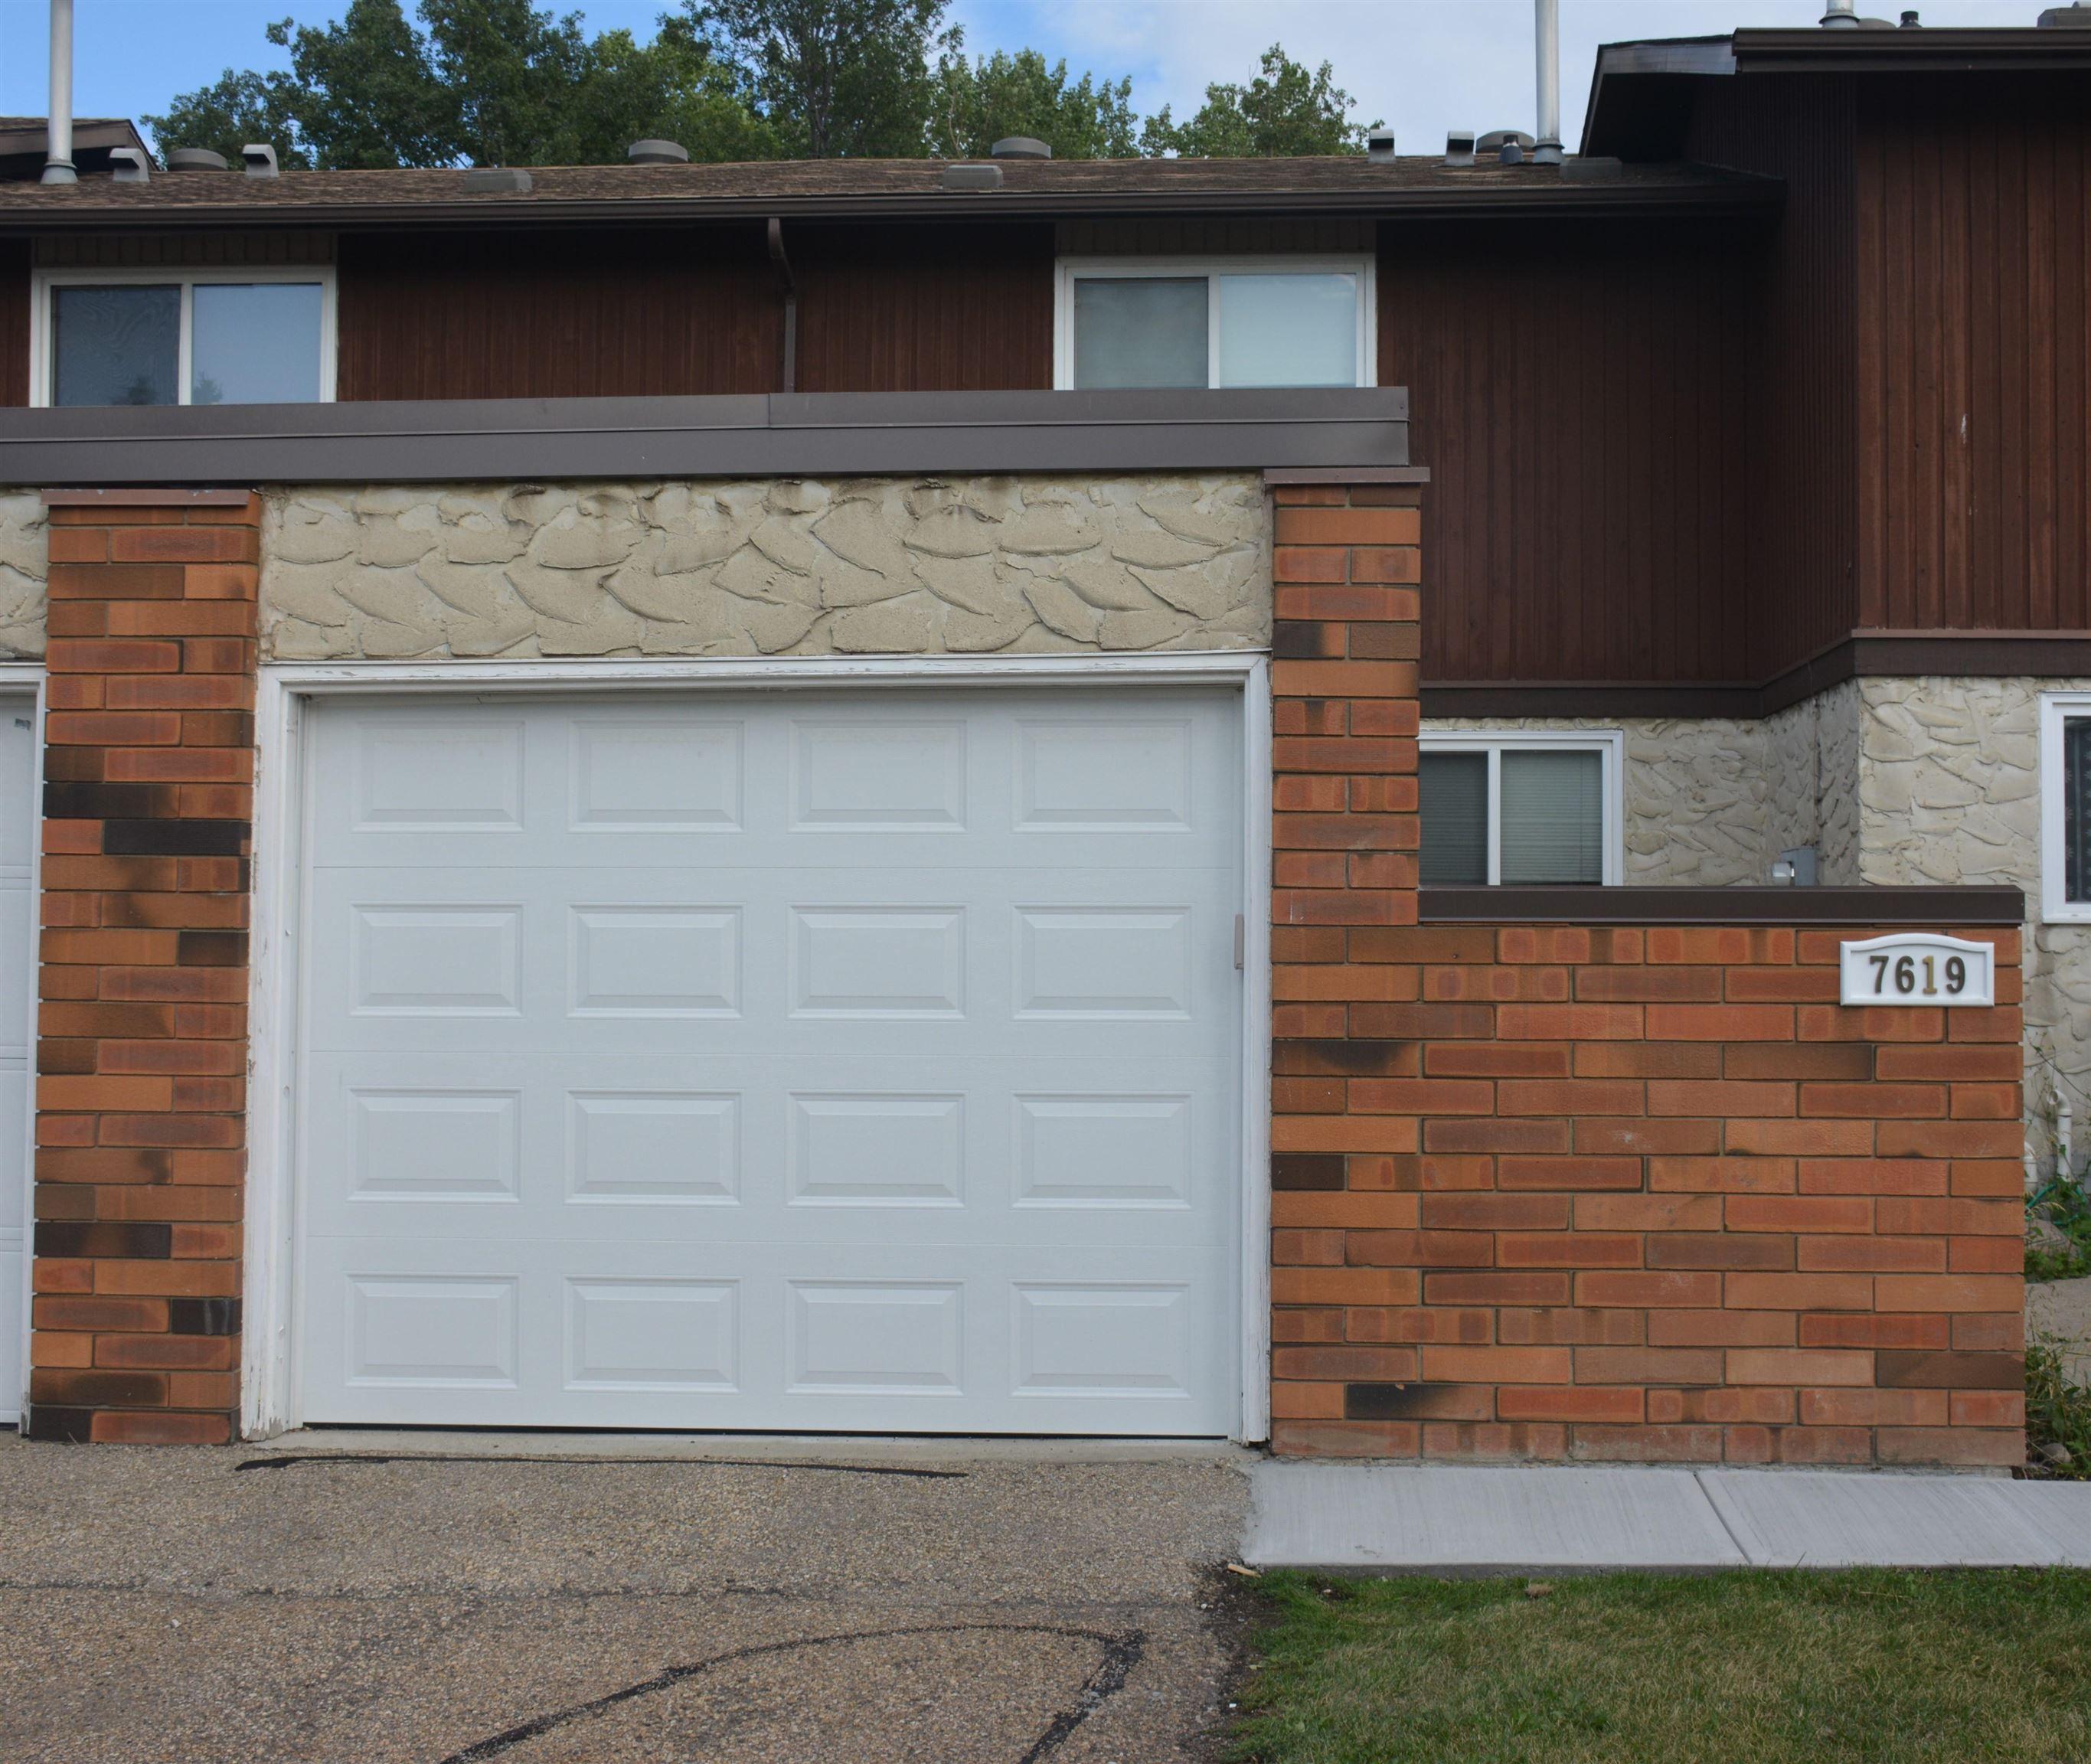 Main Photo: 7619 176 Street in Edmonton: Zone 20 Townhouse for sale : MLS®# E4261009